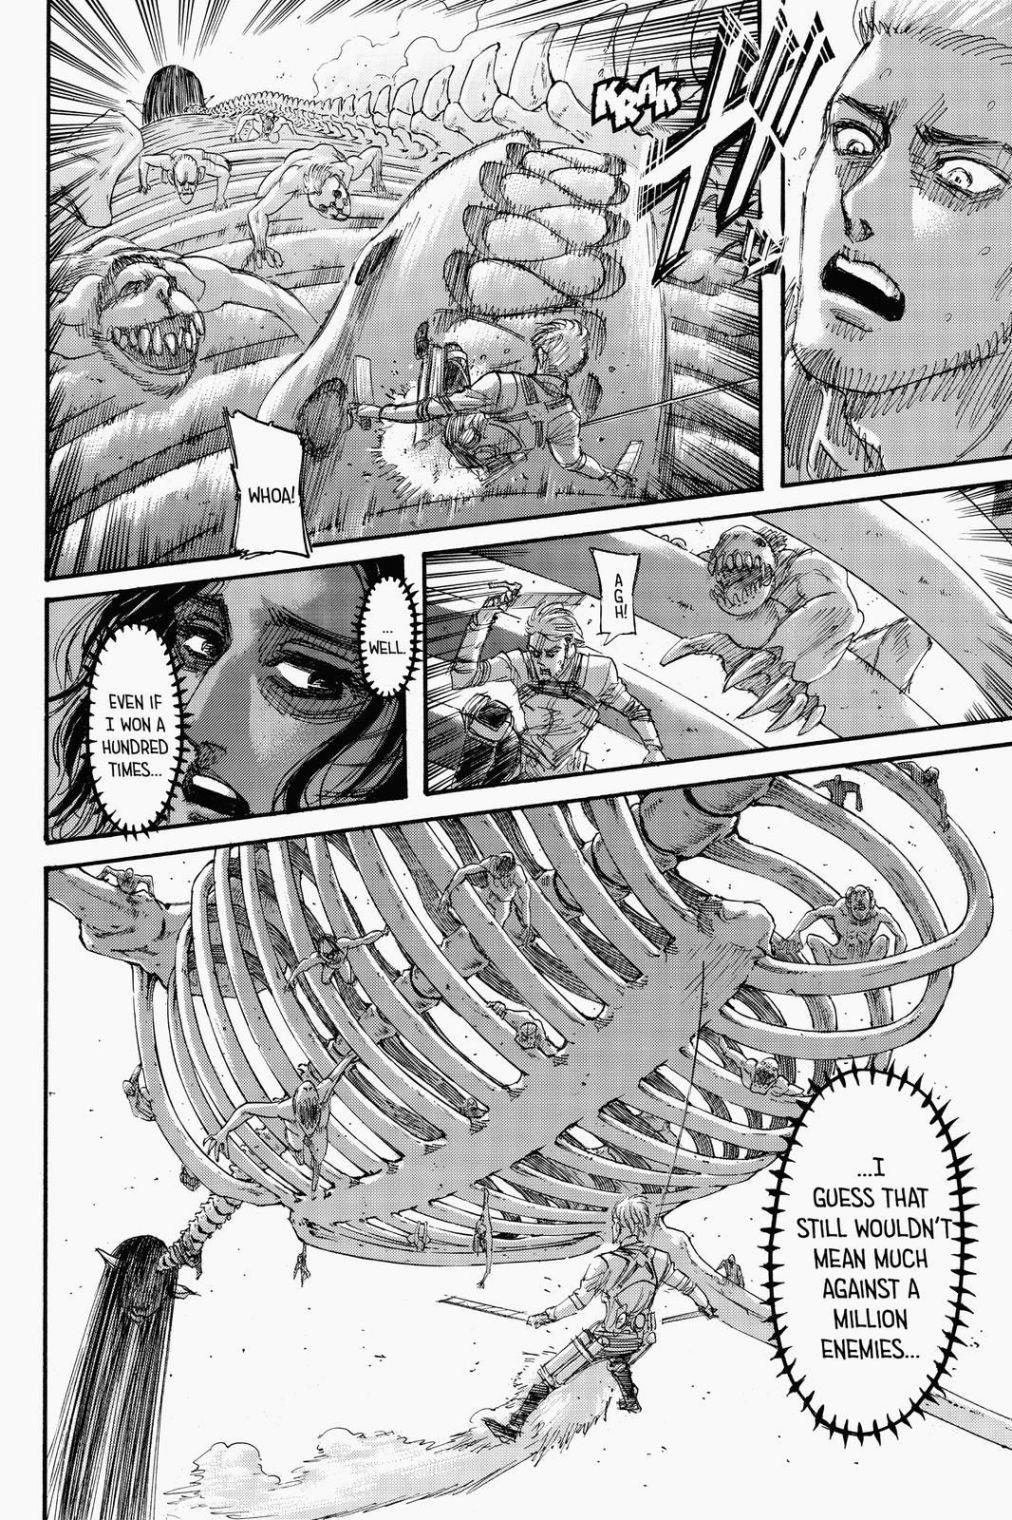 Read Manga Attack On Titan - Chapter 136 - Read Manga ...